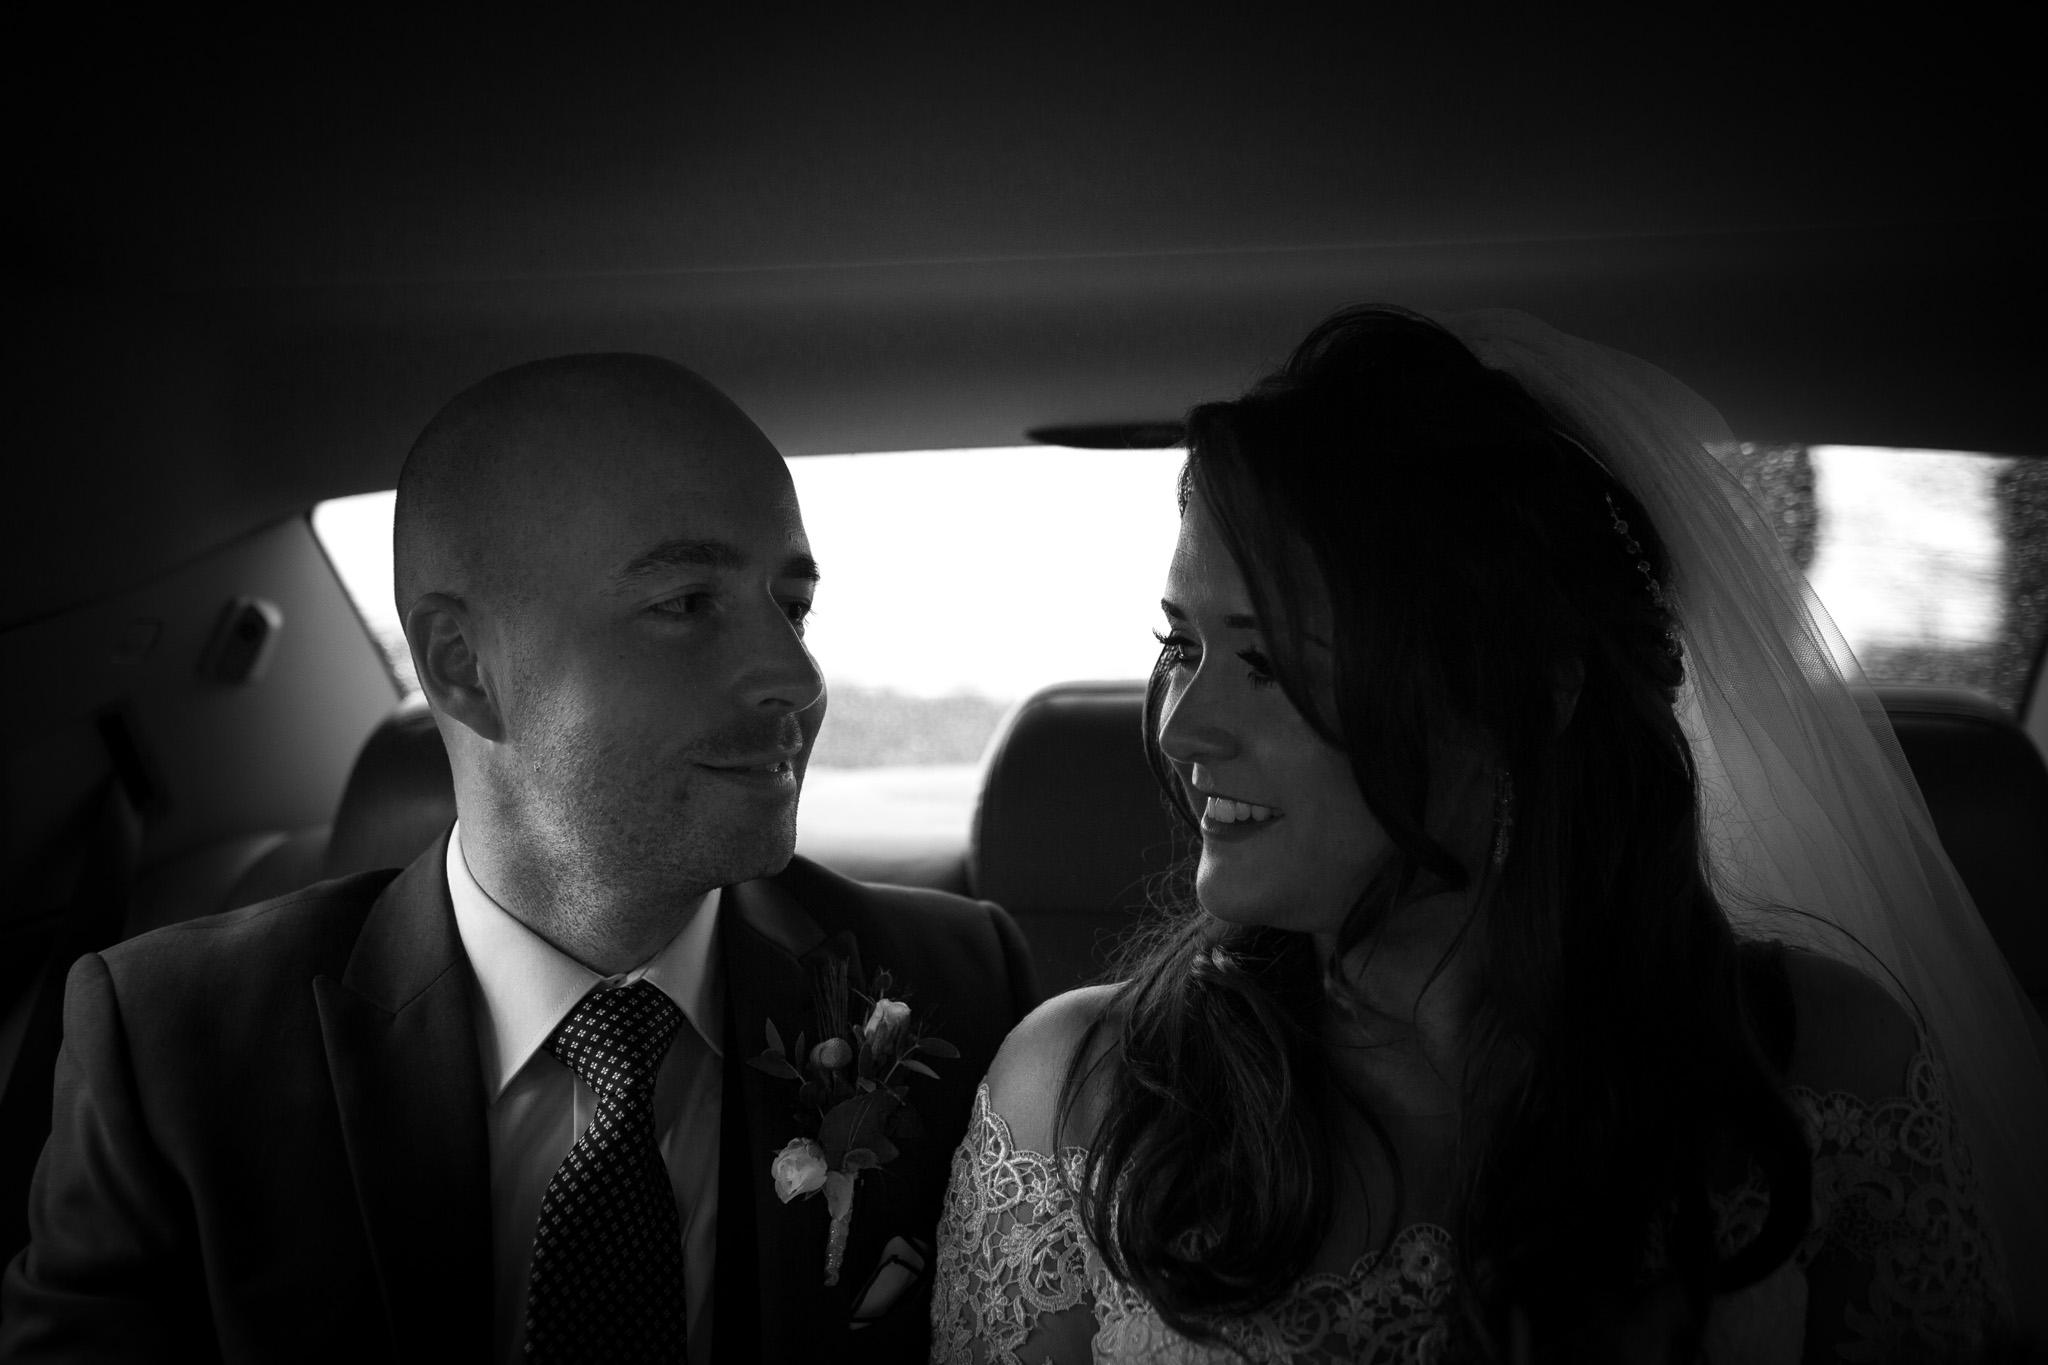 Mark_Barnes_Northern_Ireland_wedding_photographer_Harveys_Point_Donegall_Wedding_photography-Adam&Gemma-31.jpg